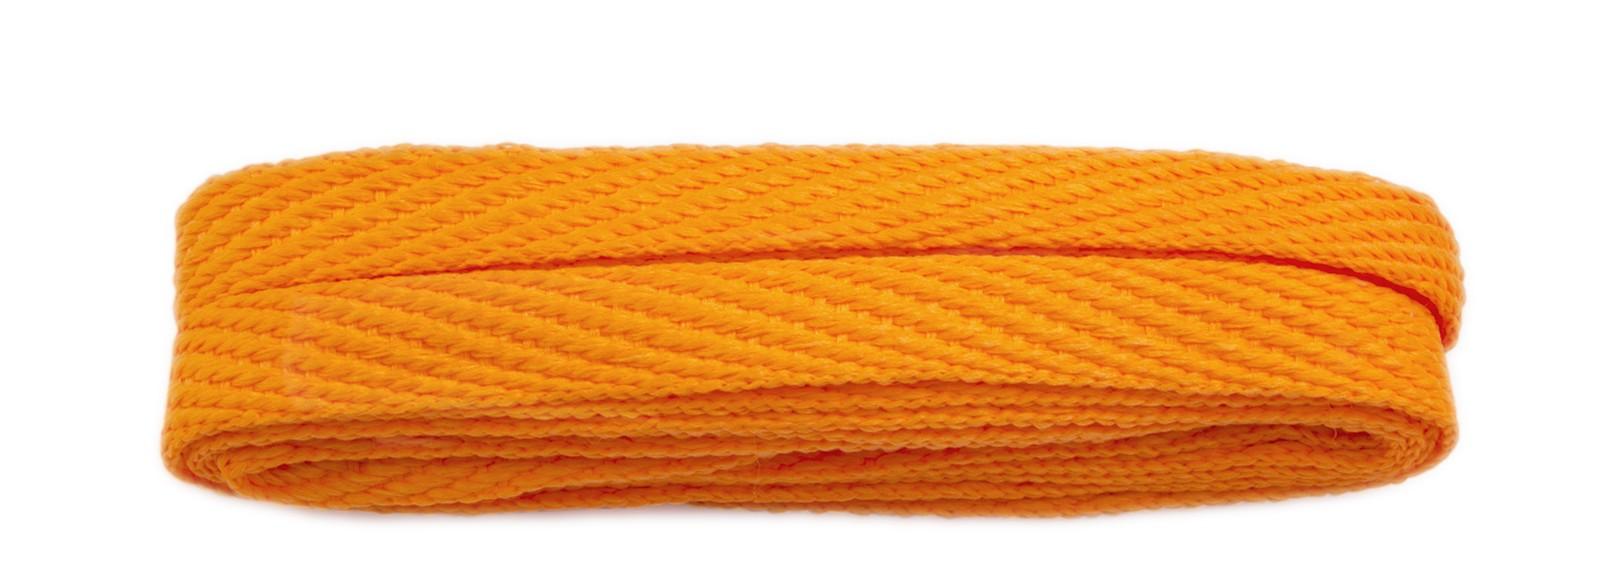 Orange 120cm American Flat 10mm Banded